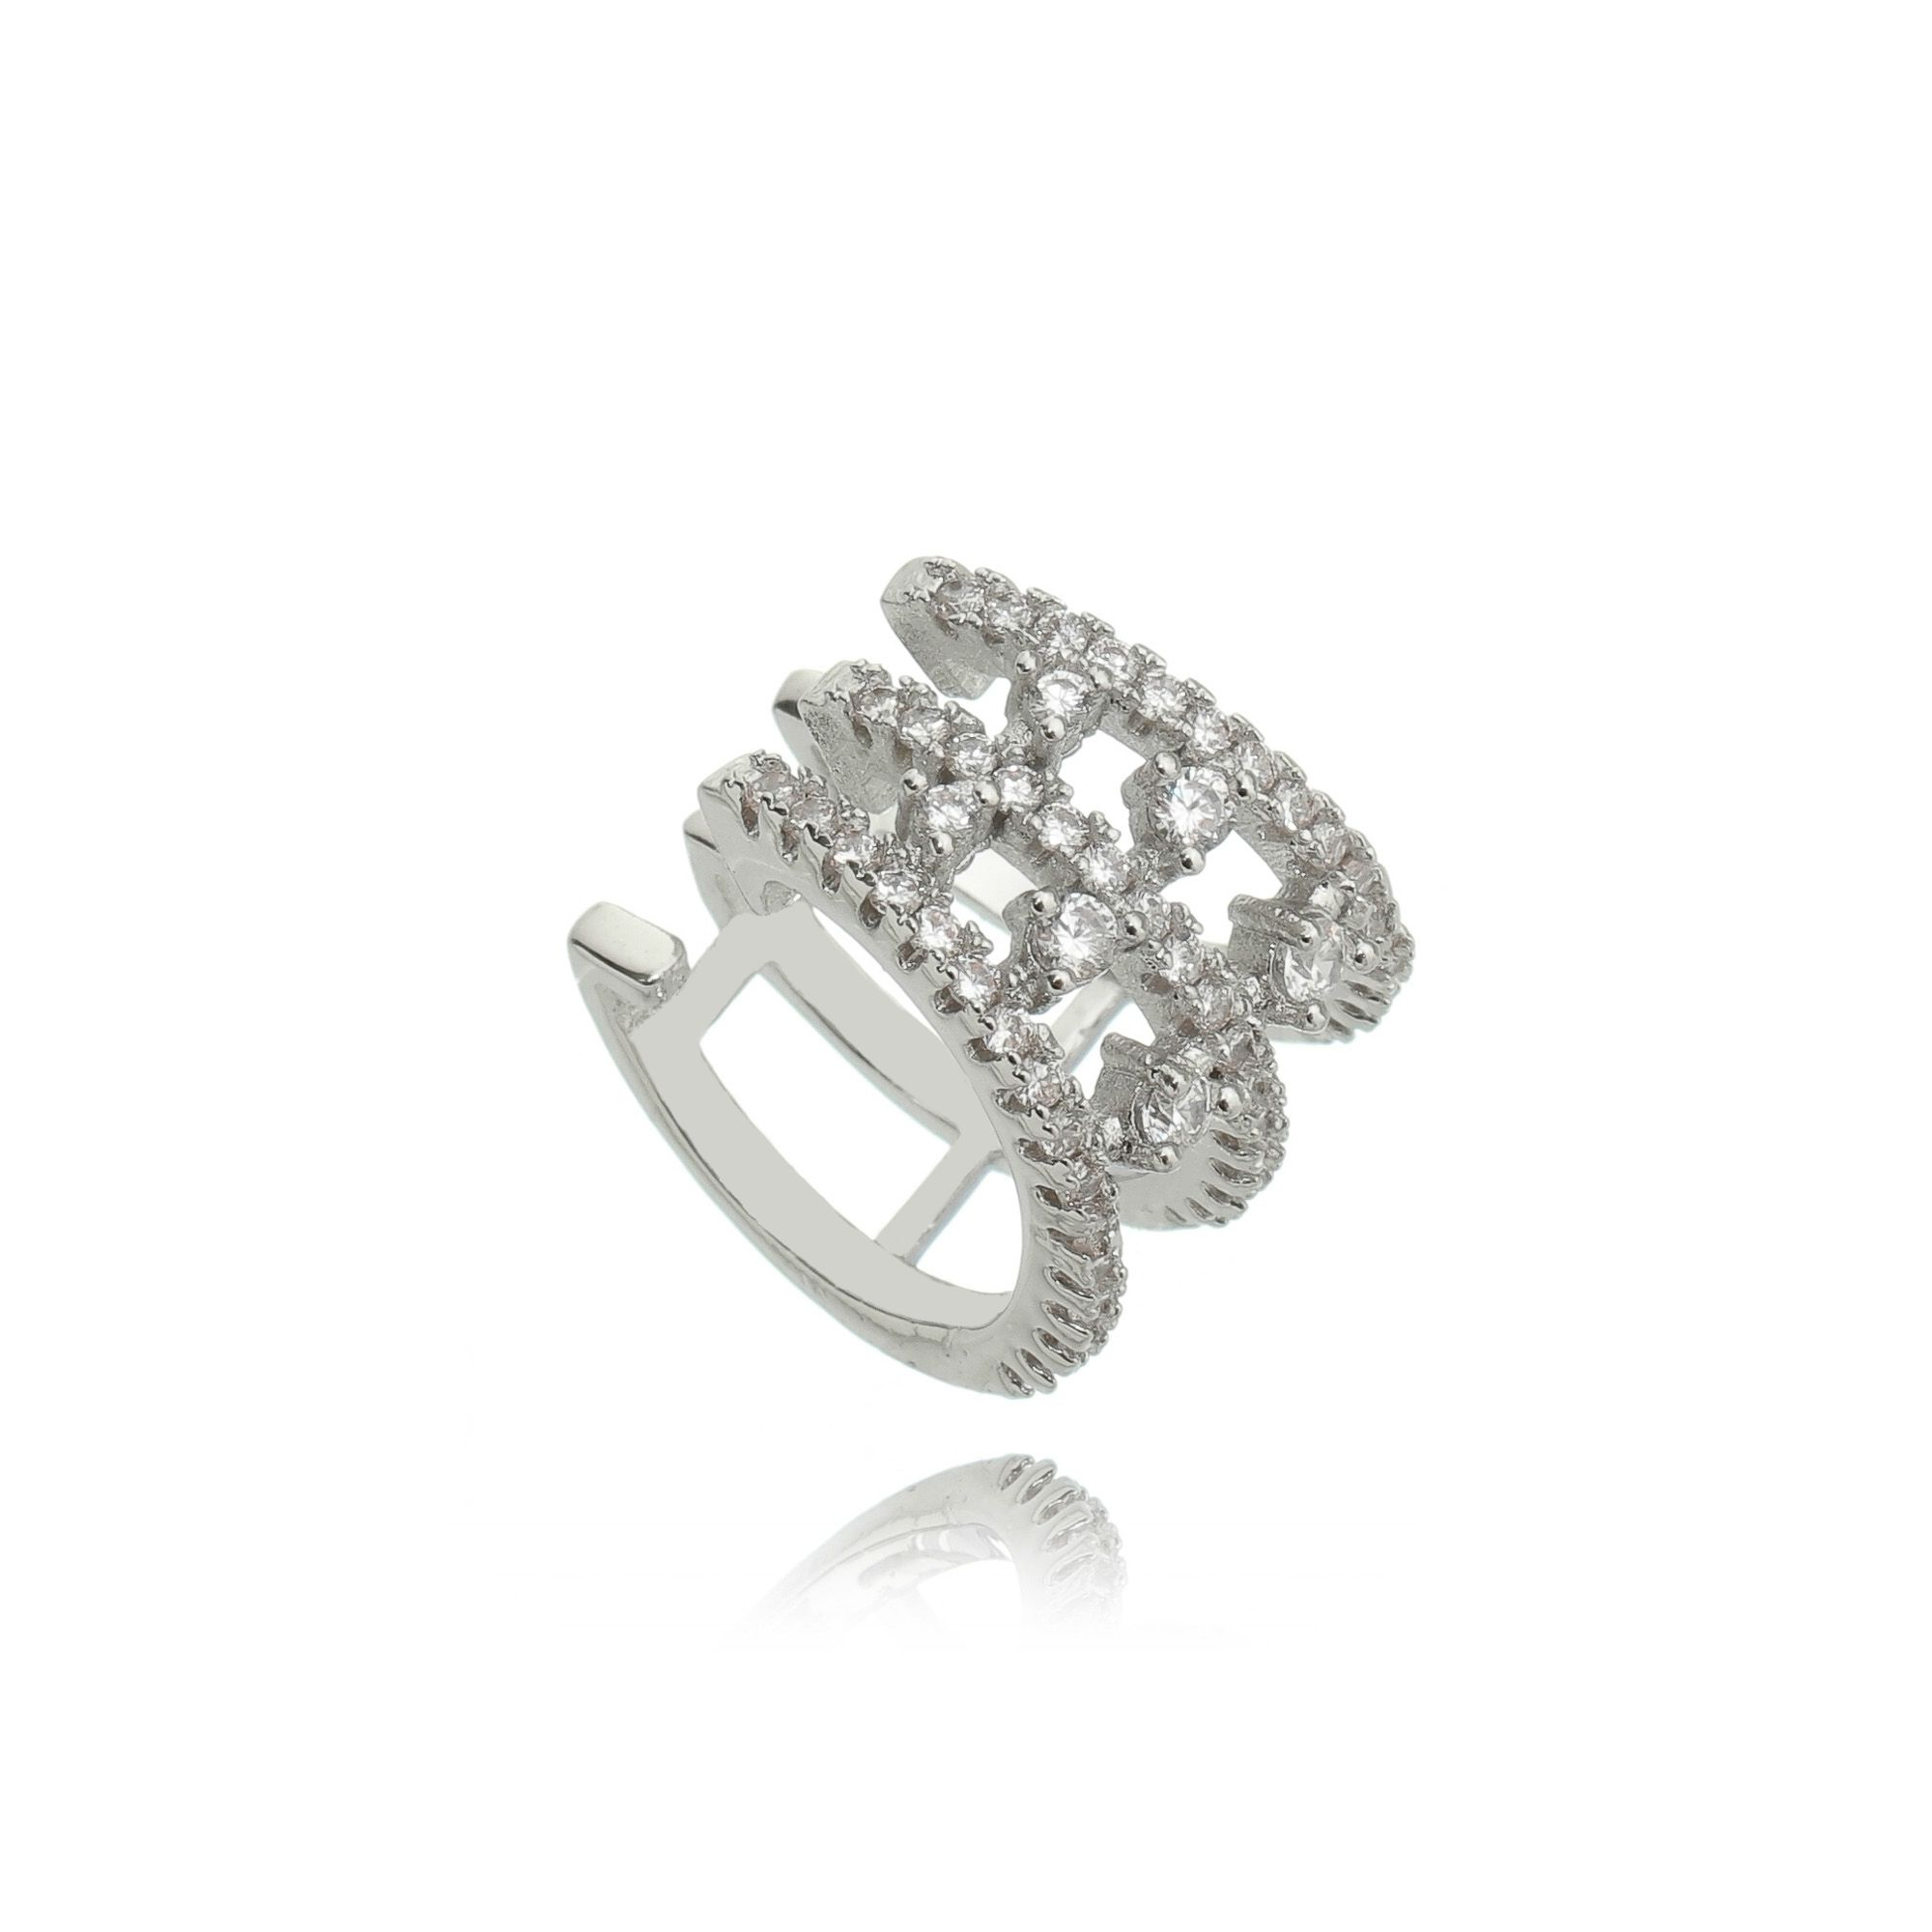 Piercing Falso de Zircônia Cristal Semijoia Fashion Ródio Branco  - SOLOYOU